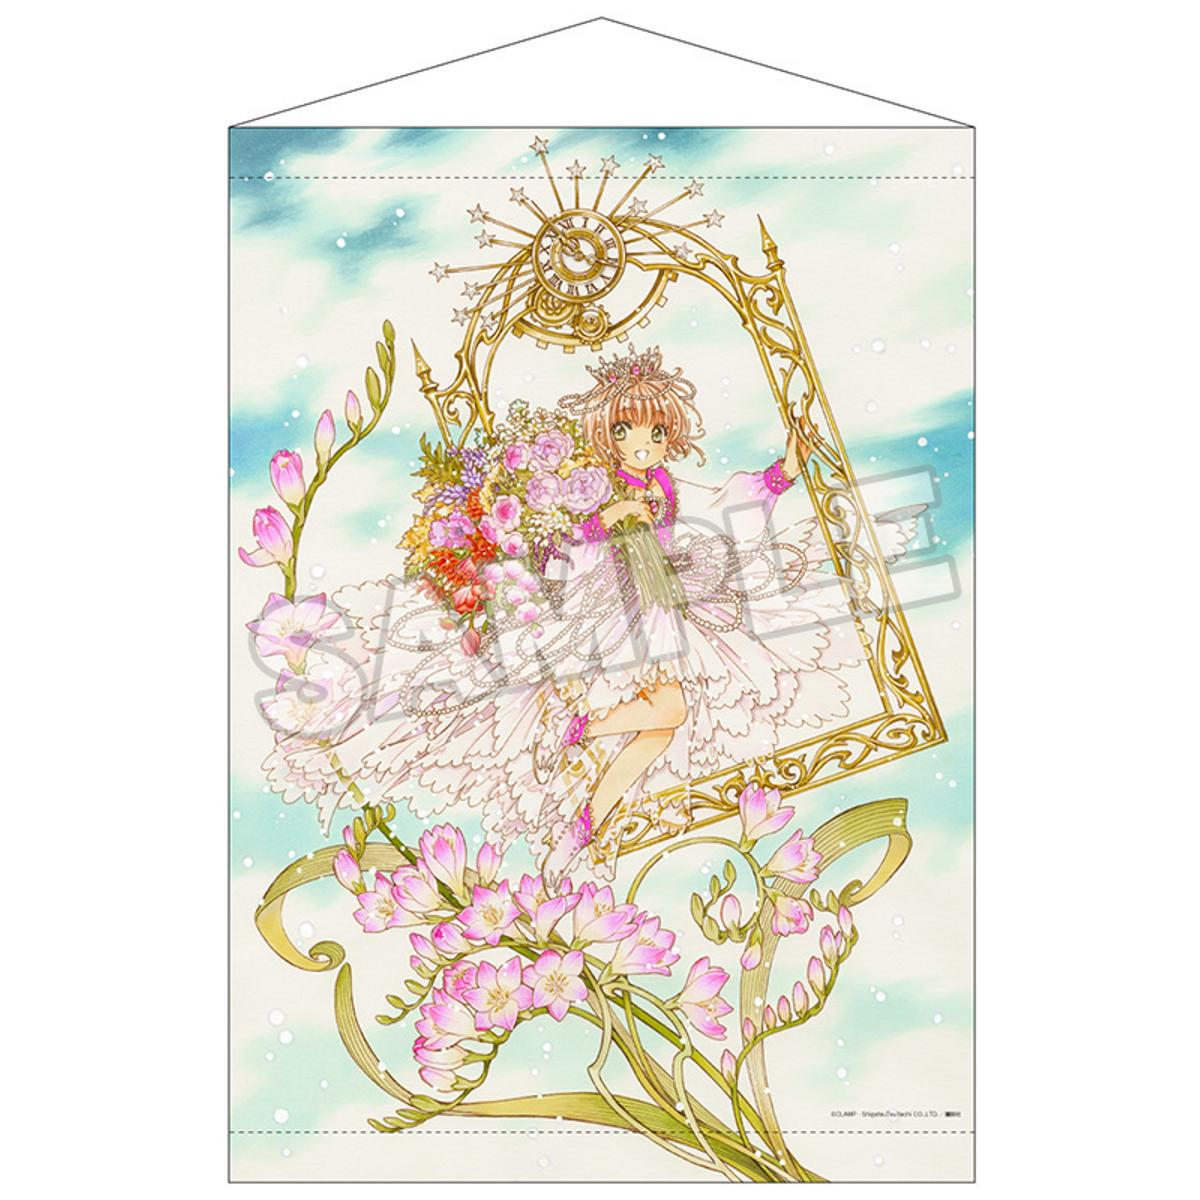 Cardcaptor Sakura A3 Tapestry